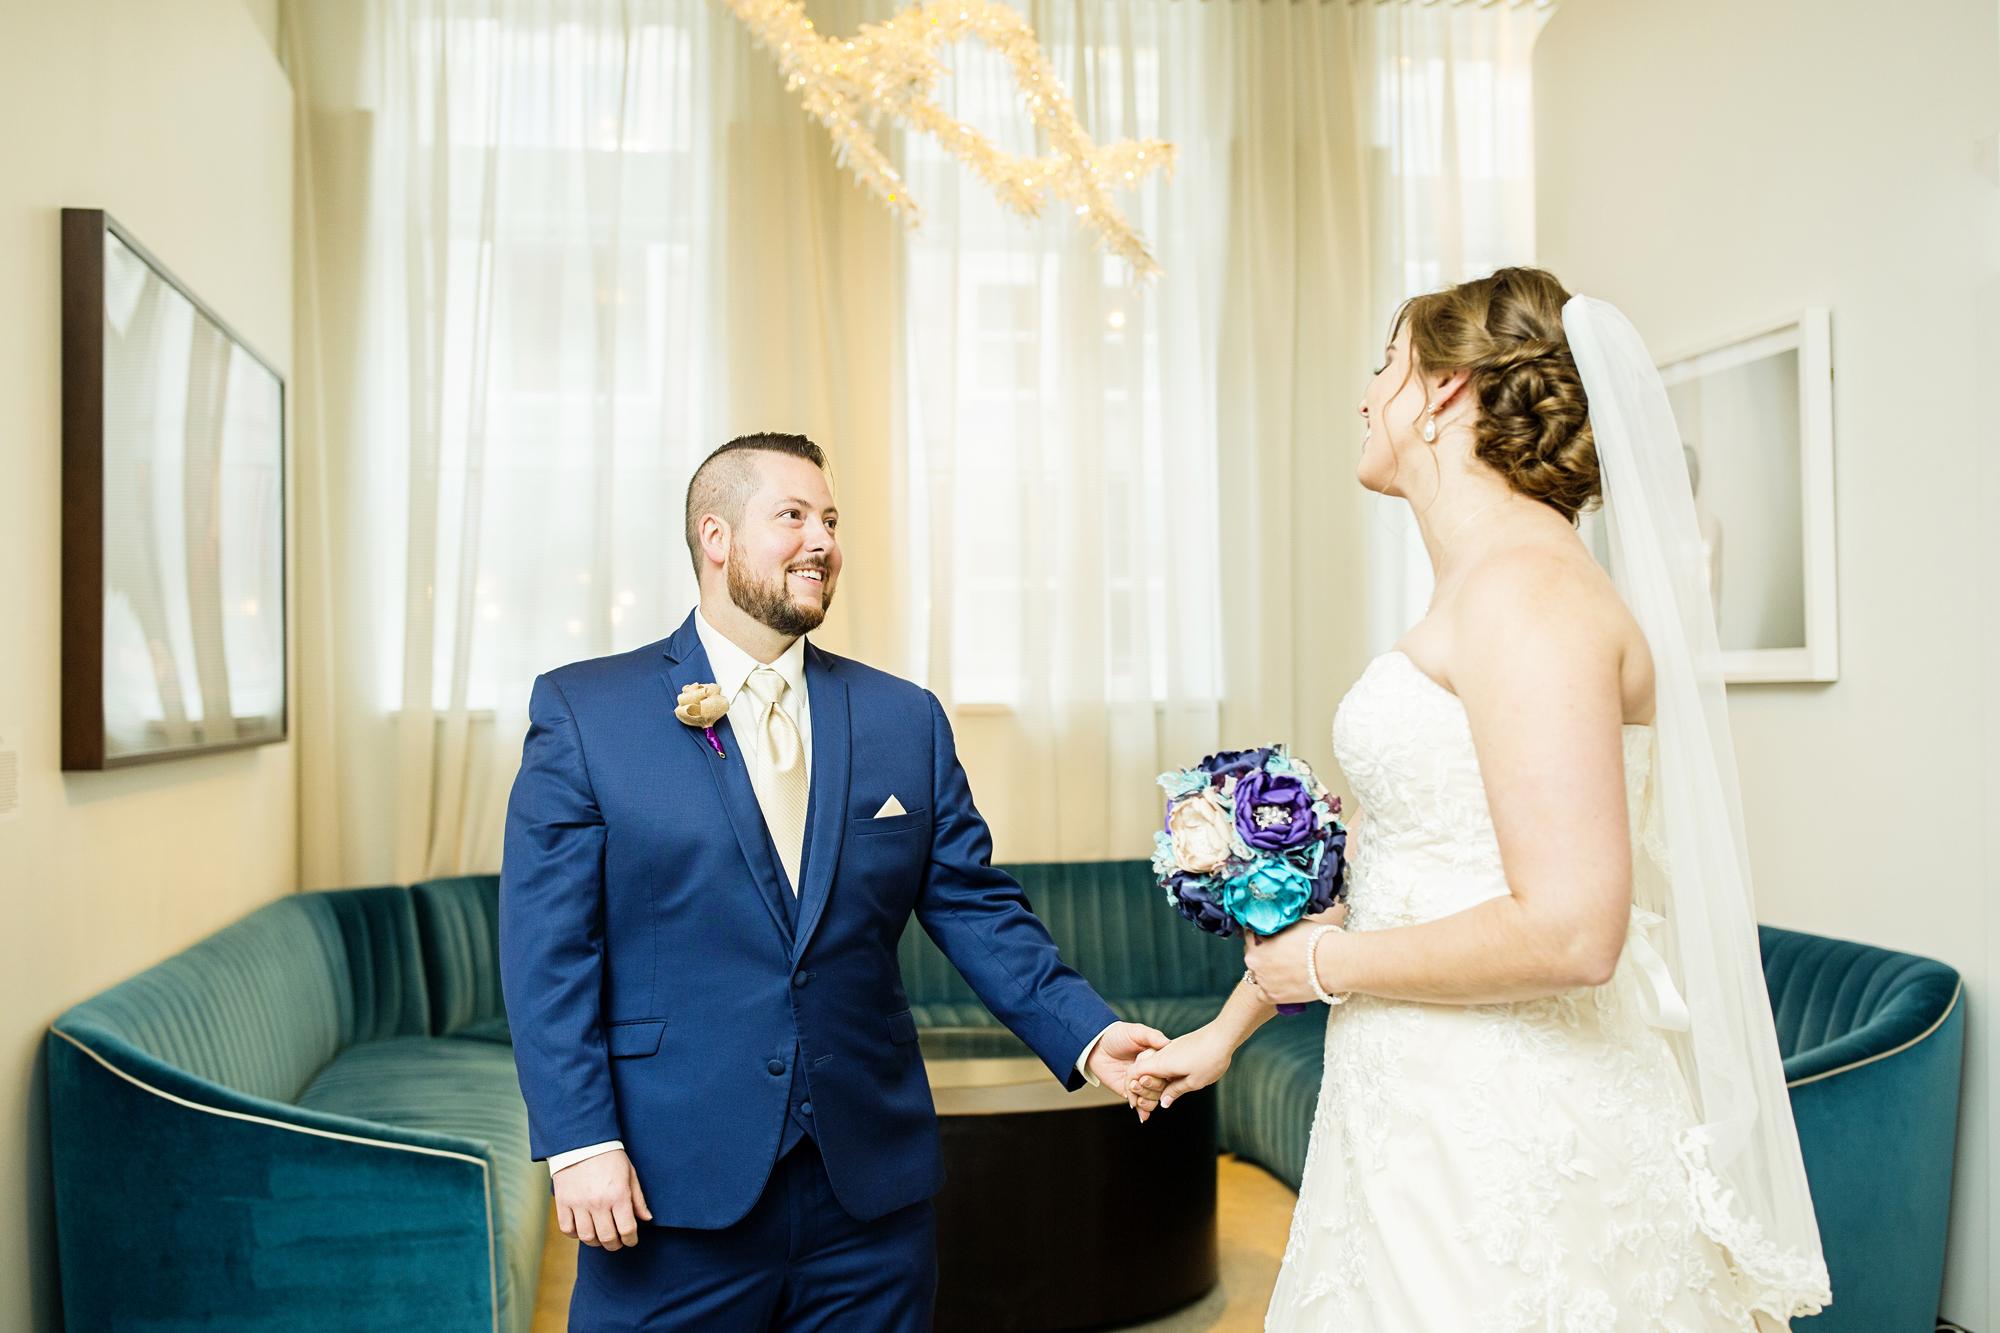 Seriously_Sabrina_Photography_Lexington_Kentucky_21c_Round_Barn_Red_Mile_Wedding_Gorley_33.jpg